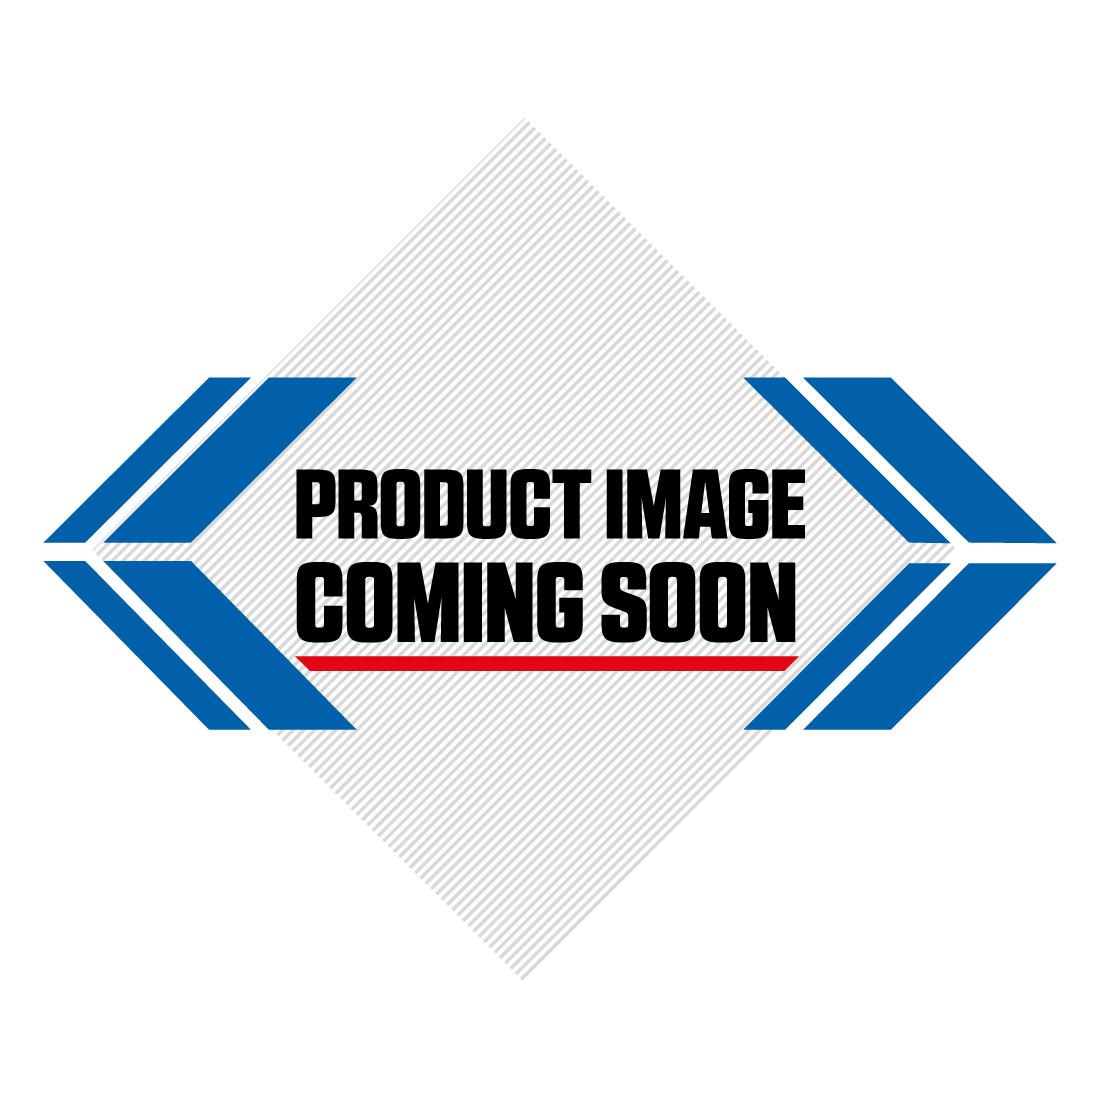 c04919242 SM Pro Platinum Motocross Front Wheel - KTM Blue Black Blue   MD ...